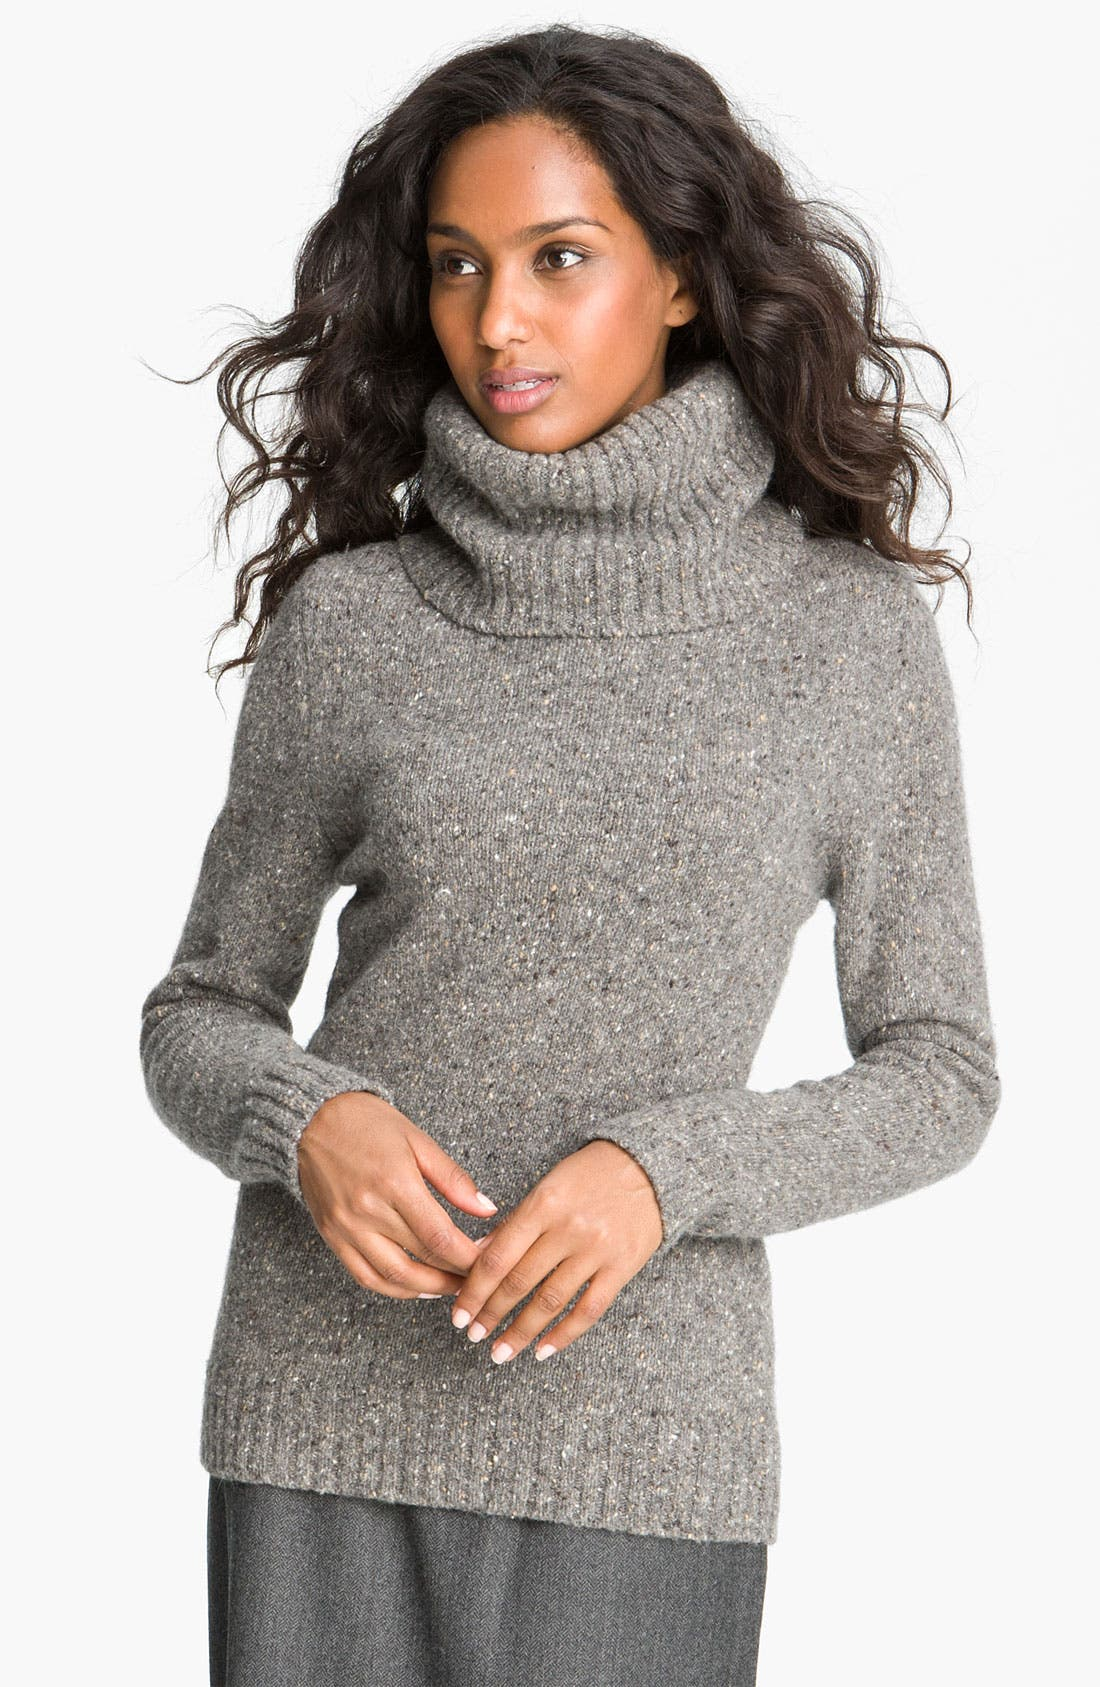 Alternate Image 1 Selected - Weekend Max Mara 'Fontana' Turtleneck Sweater